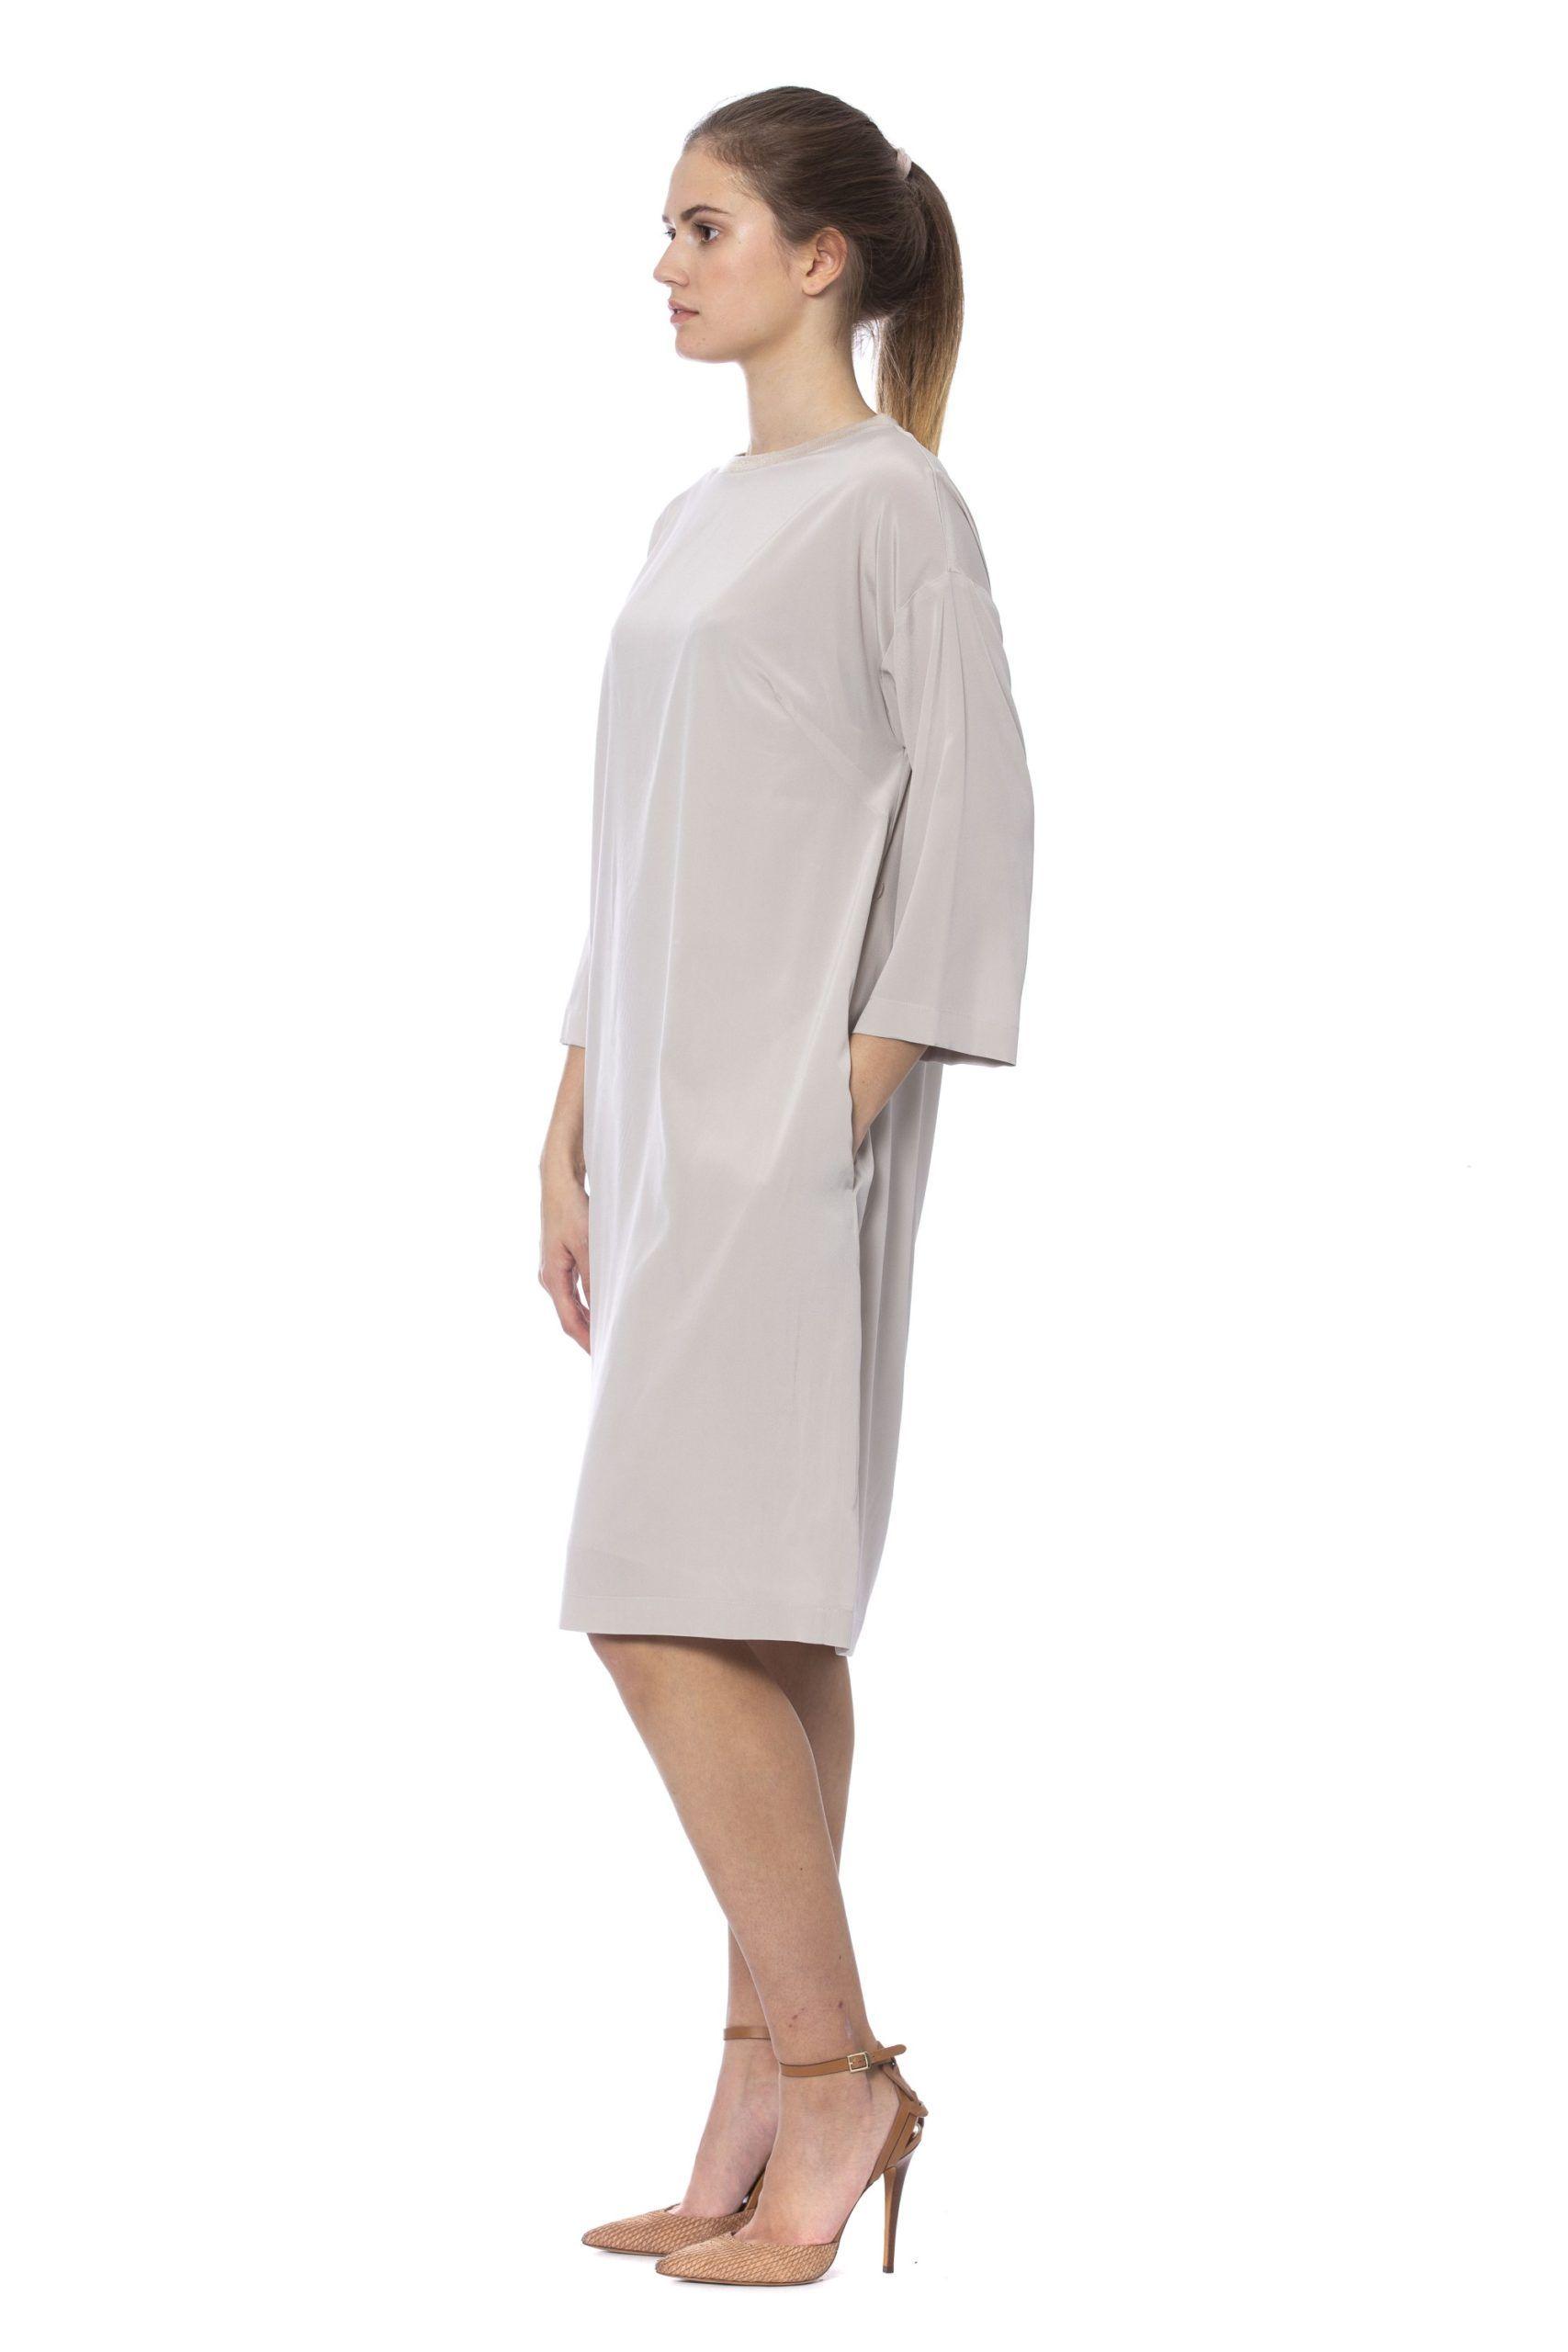 Peserico Beige Dress